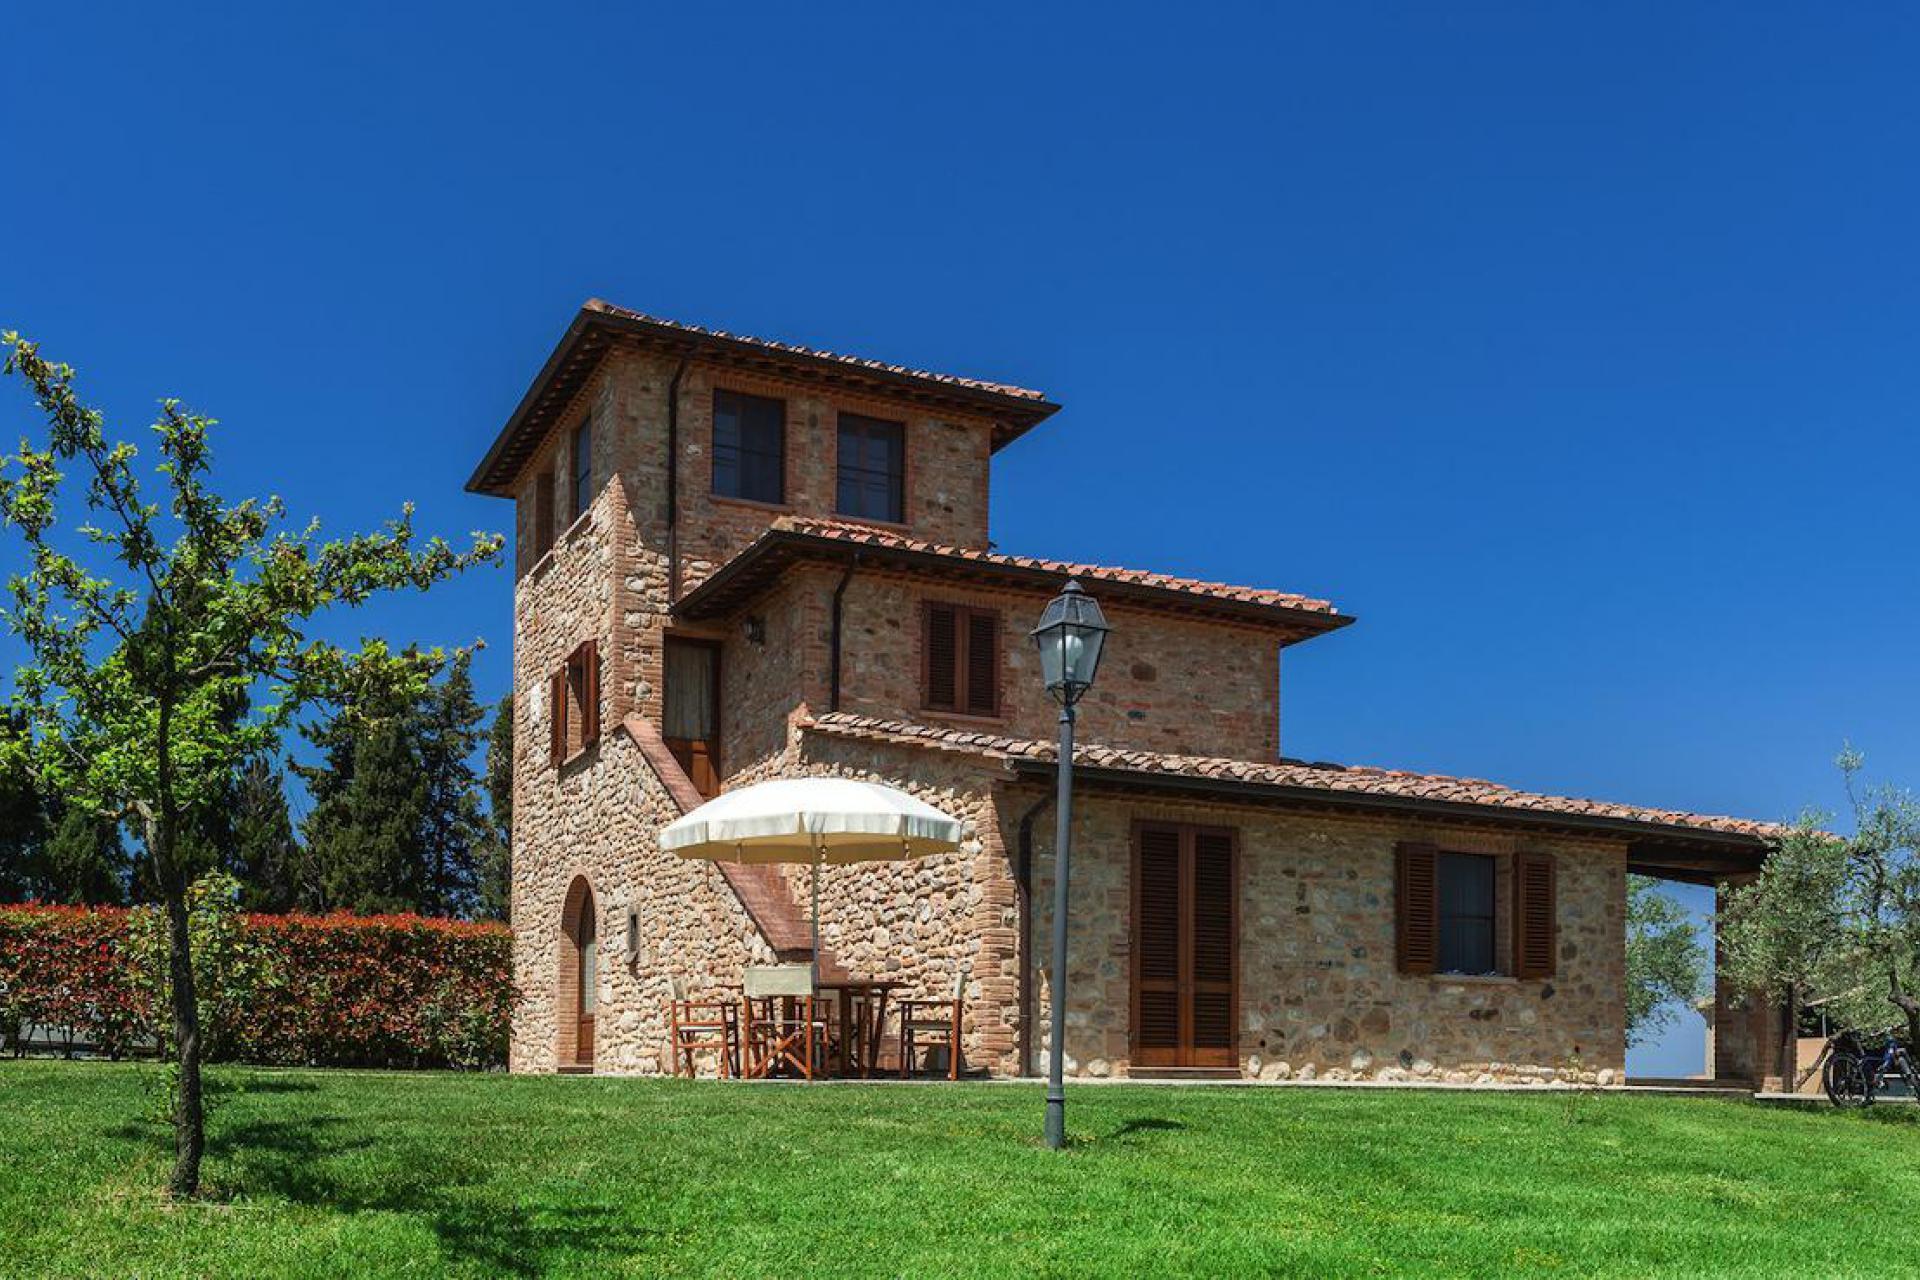 Agriturismo Tuscany Welcoming agriturismo in Tuscany where la mamma cooks